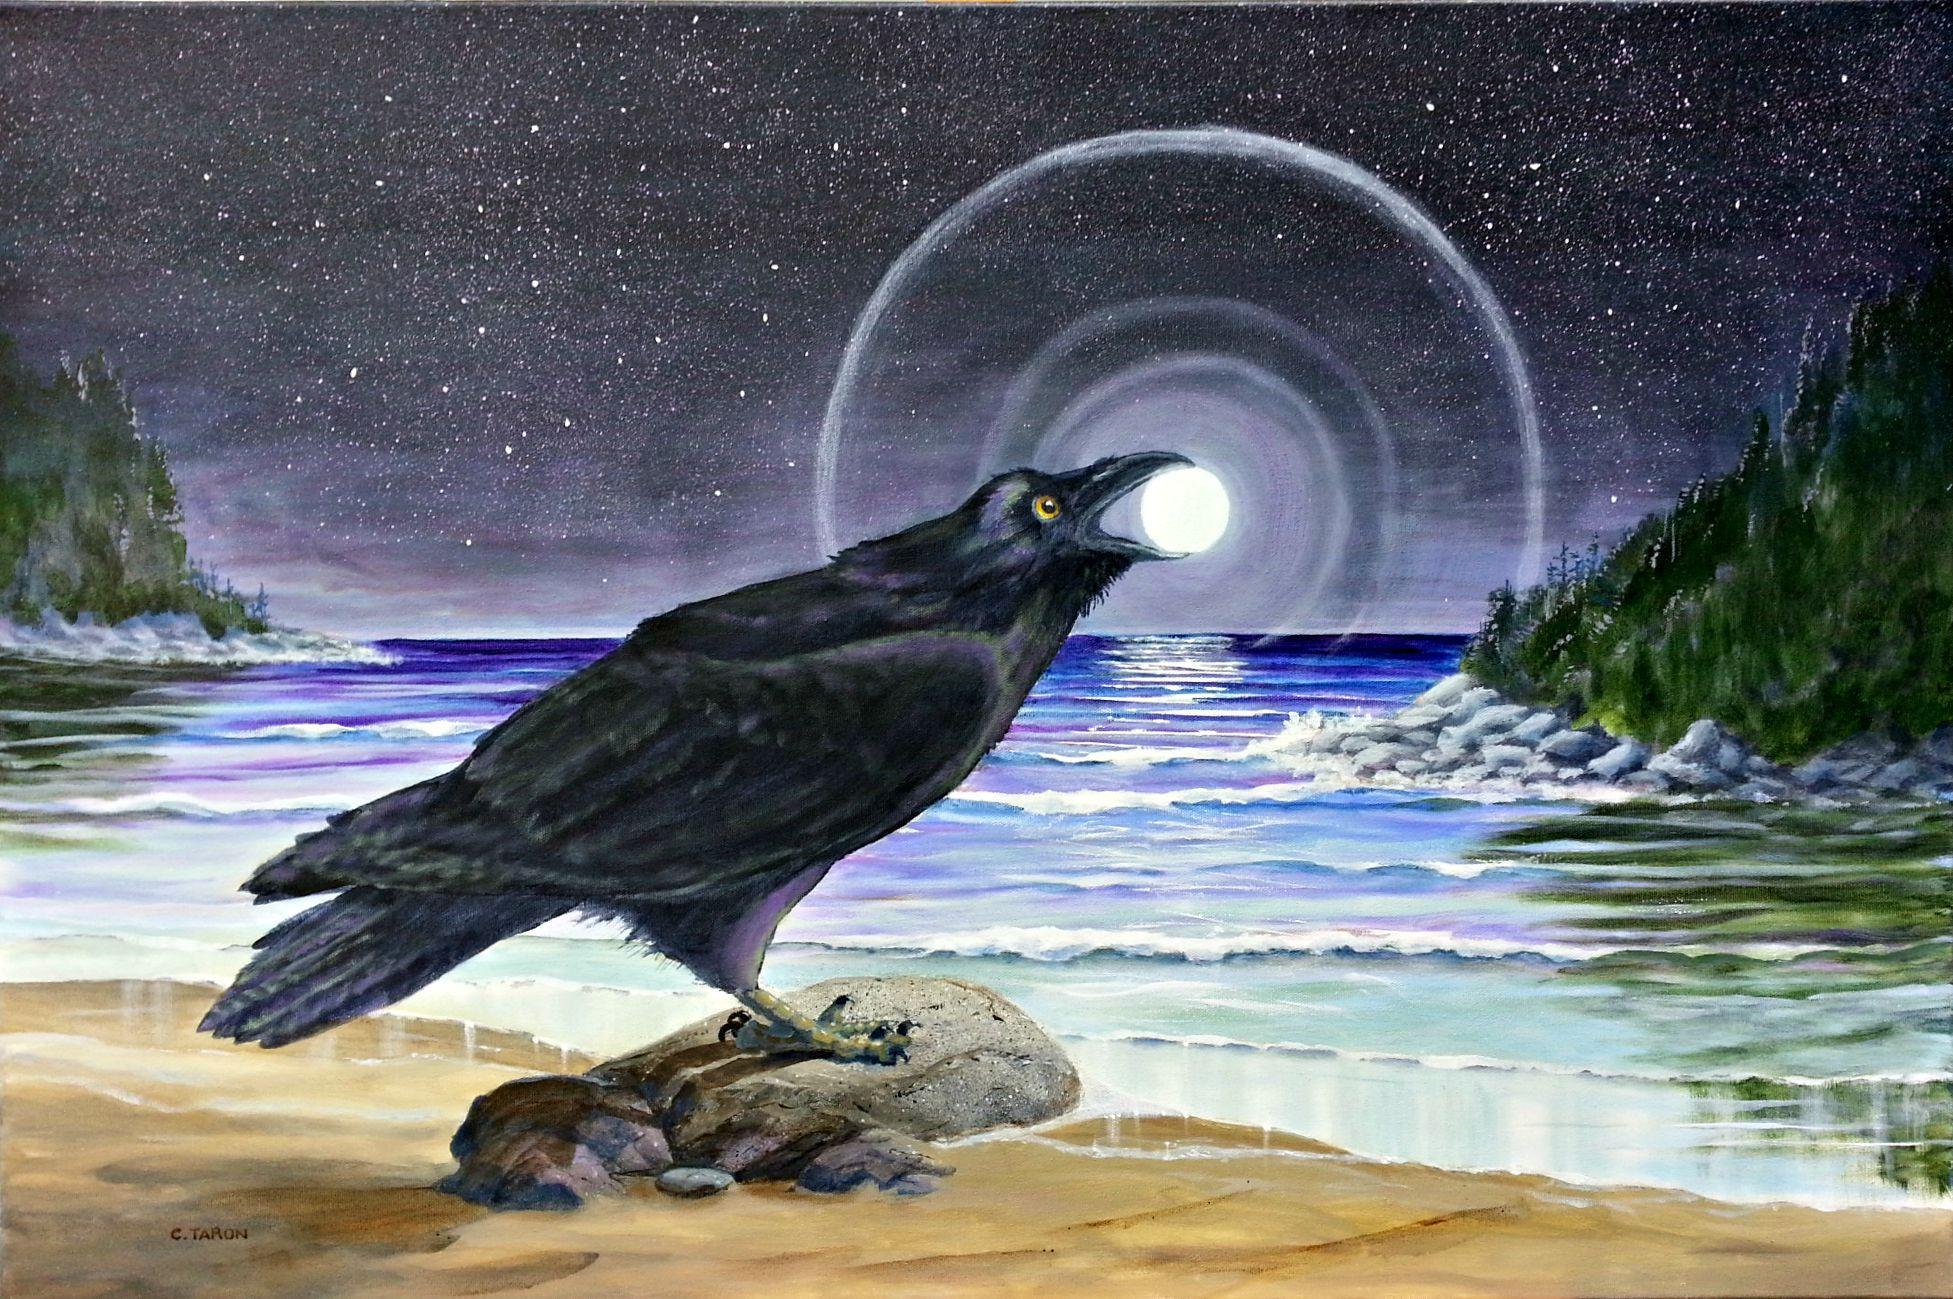 Taron, Catherine - Trickster Moon